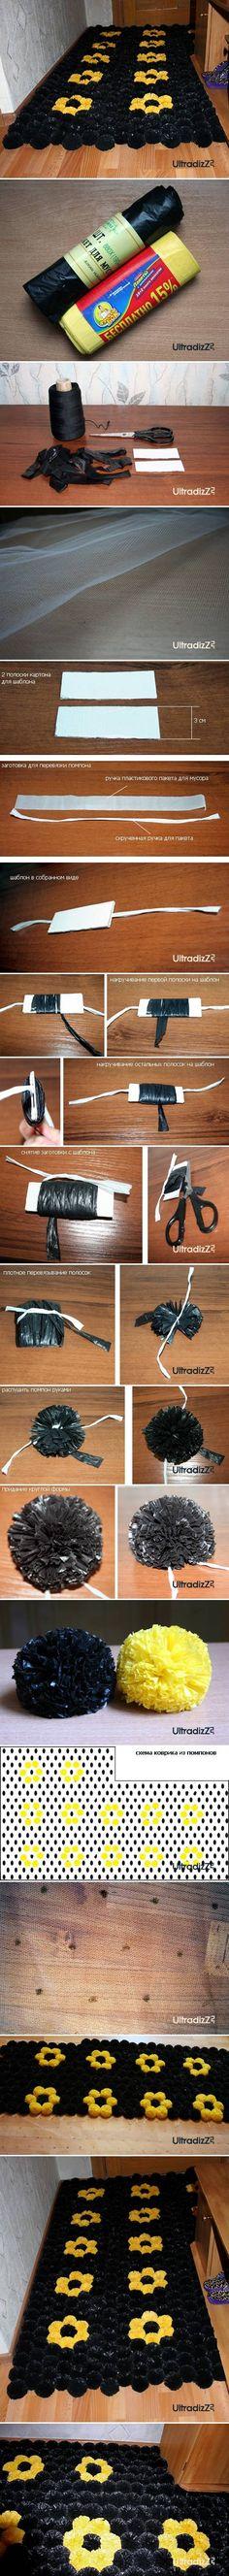 DIY Plastic Bag Pom Pom Mat DIY Plastic Bag Pom Pom Mat